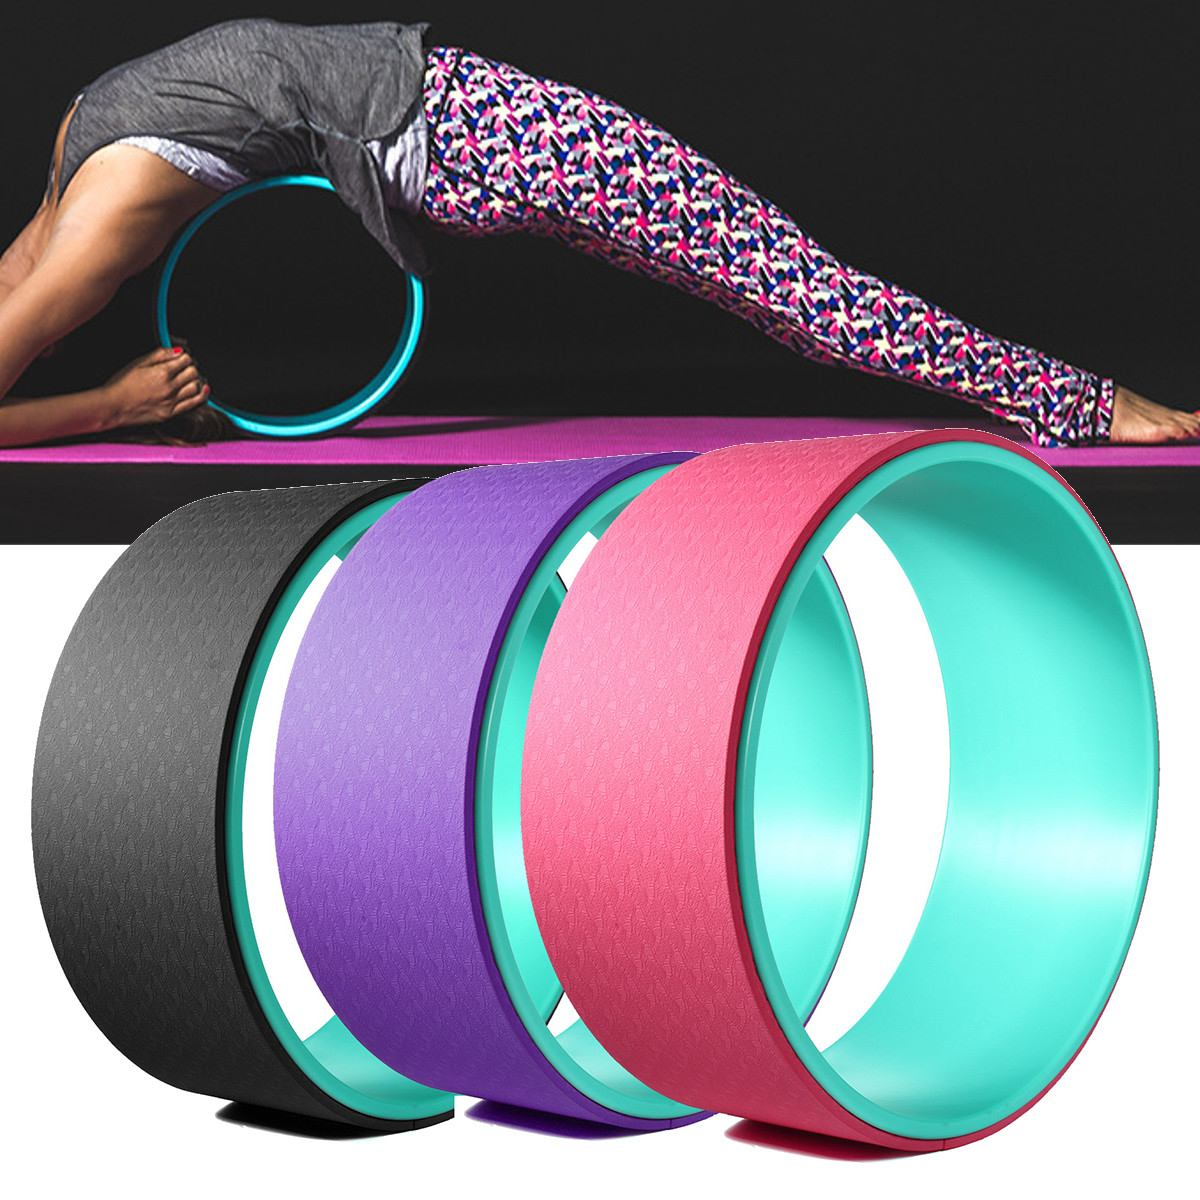 ①  TPE Yoga Wheel Muscle Расслабляющий Фитнес-Экстра Сила Йога Круги Тренажерный Зал Реквизит Фитнес Бо ✔